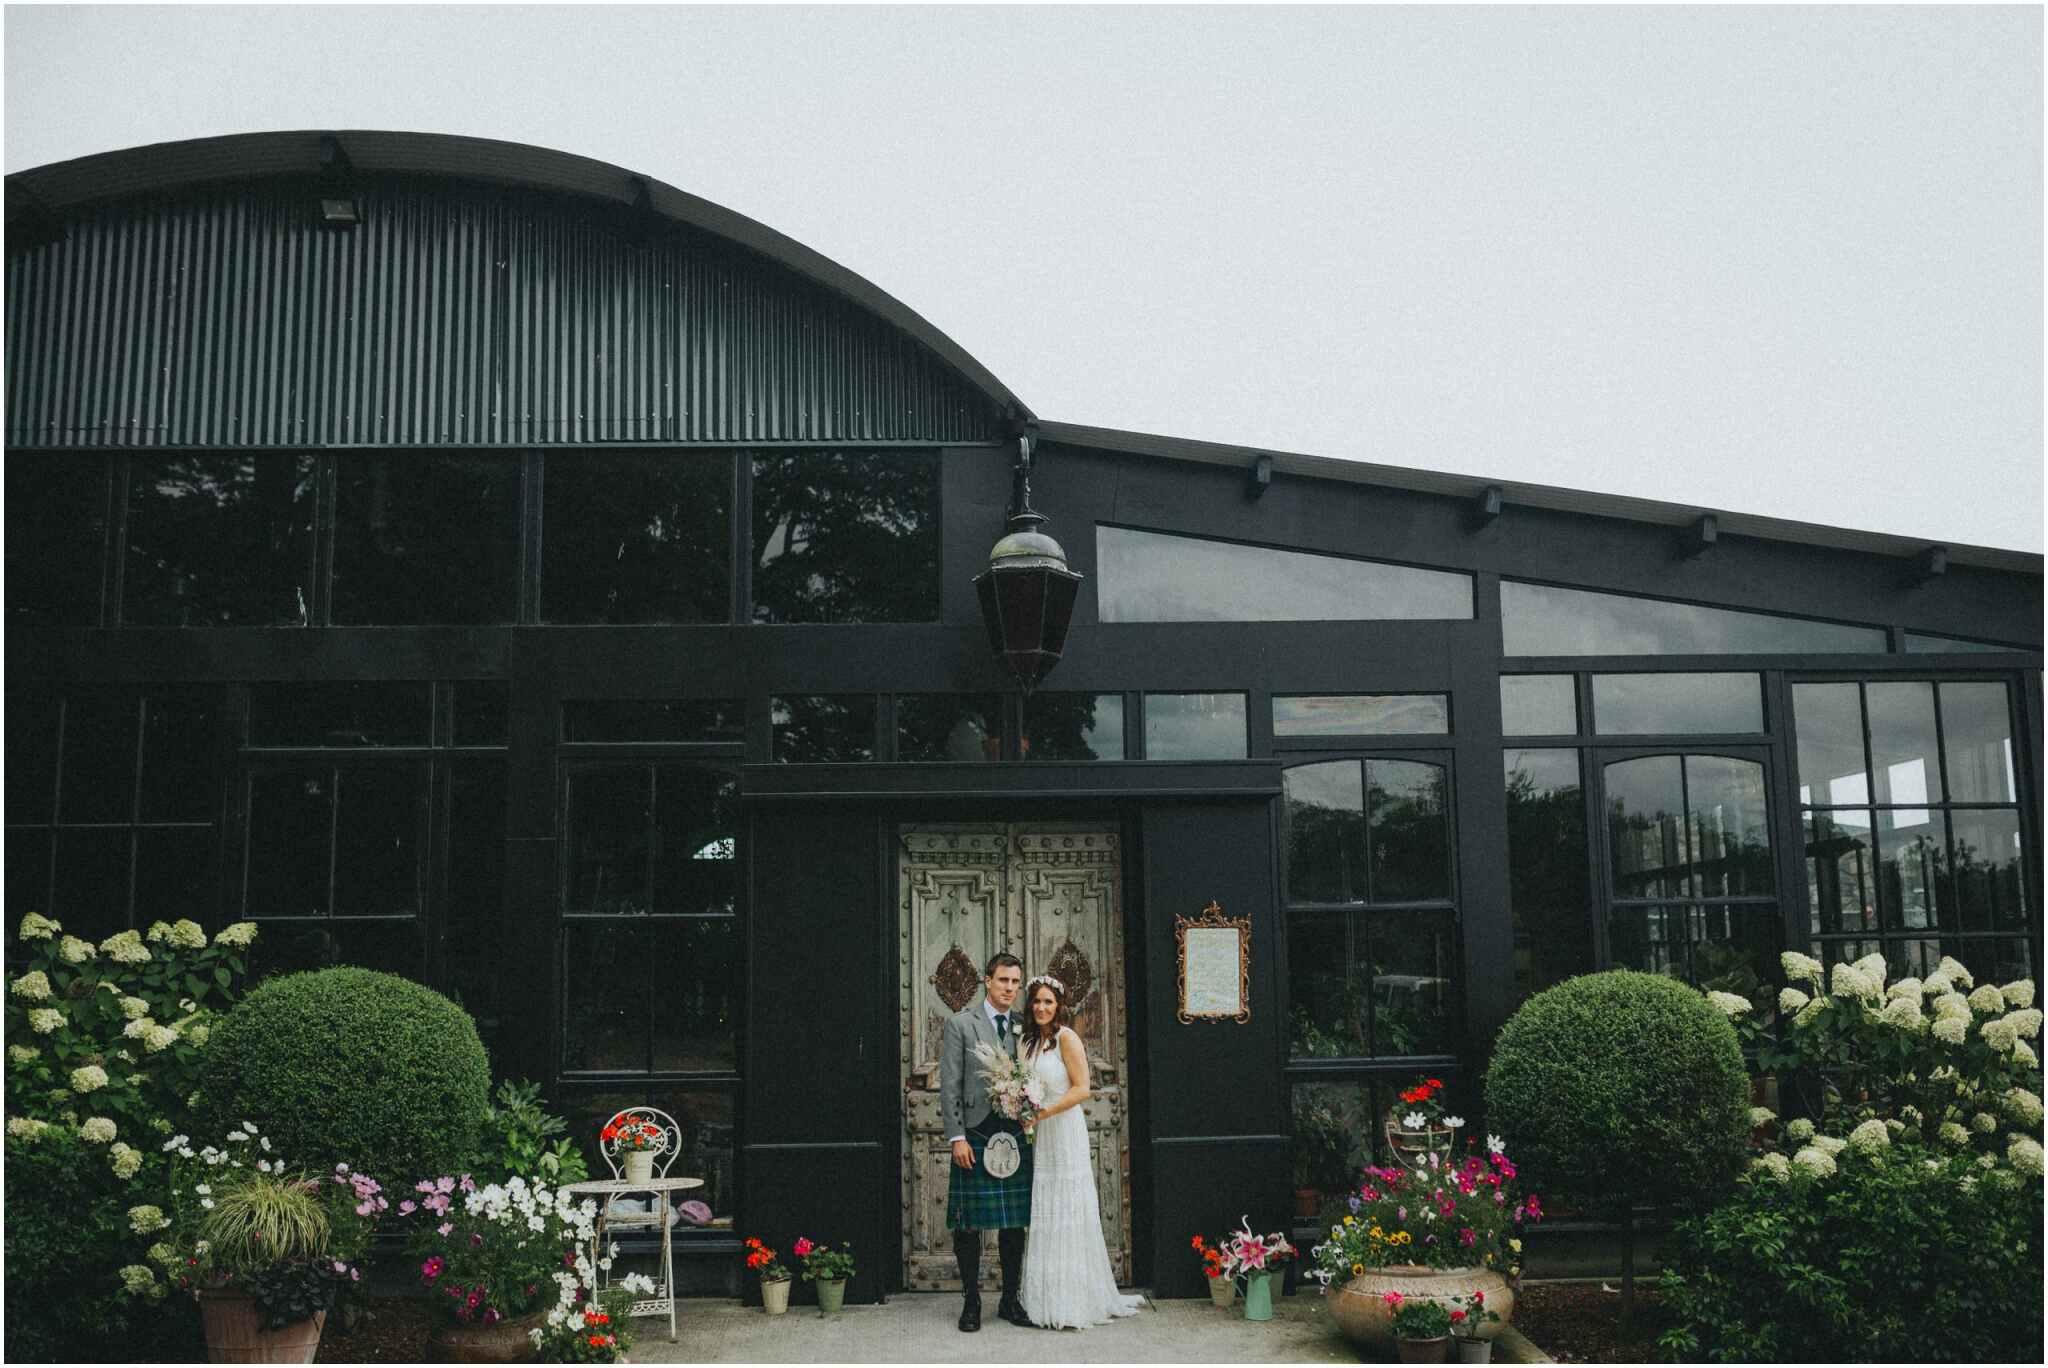 Fionnuala + Paul - Mount Druid Alternative Wedding 146